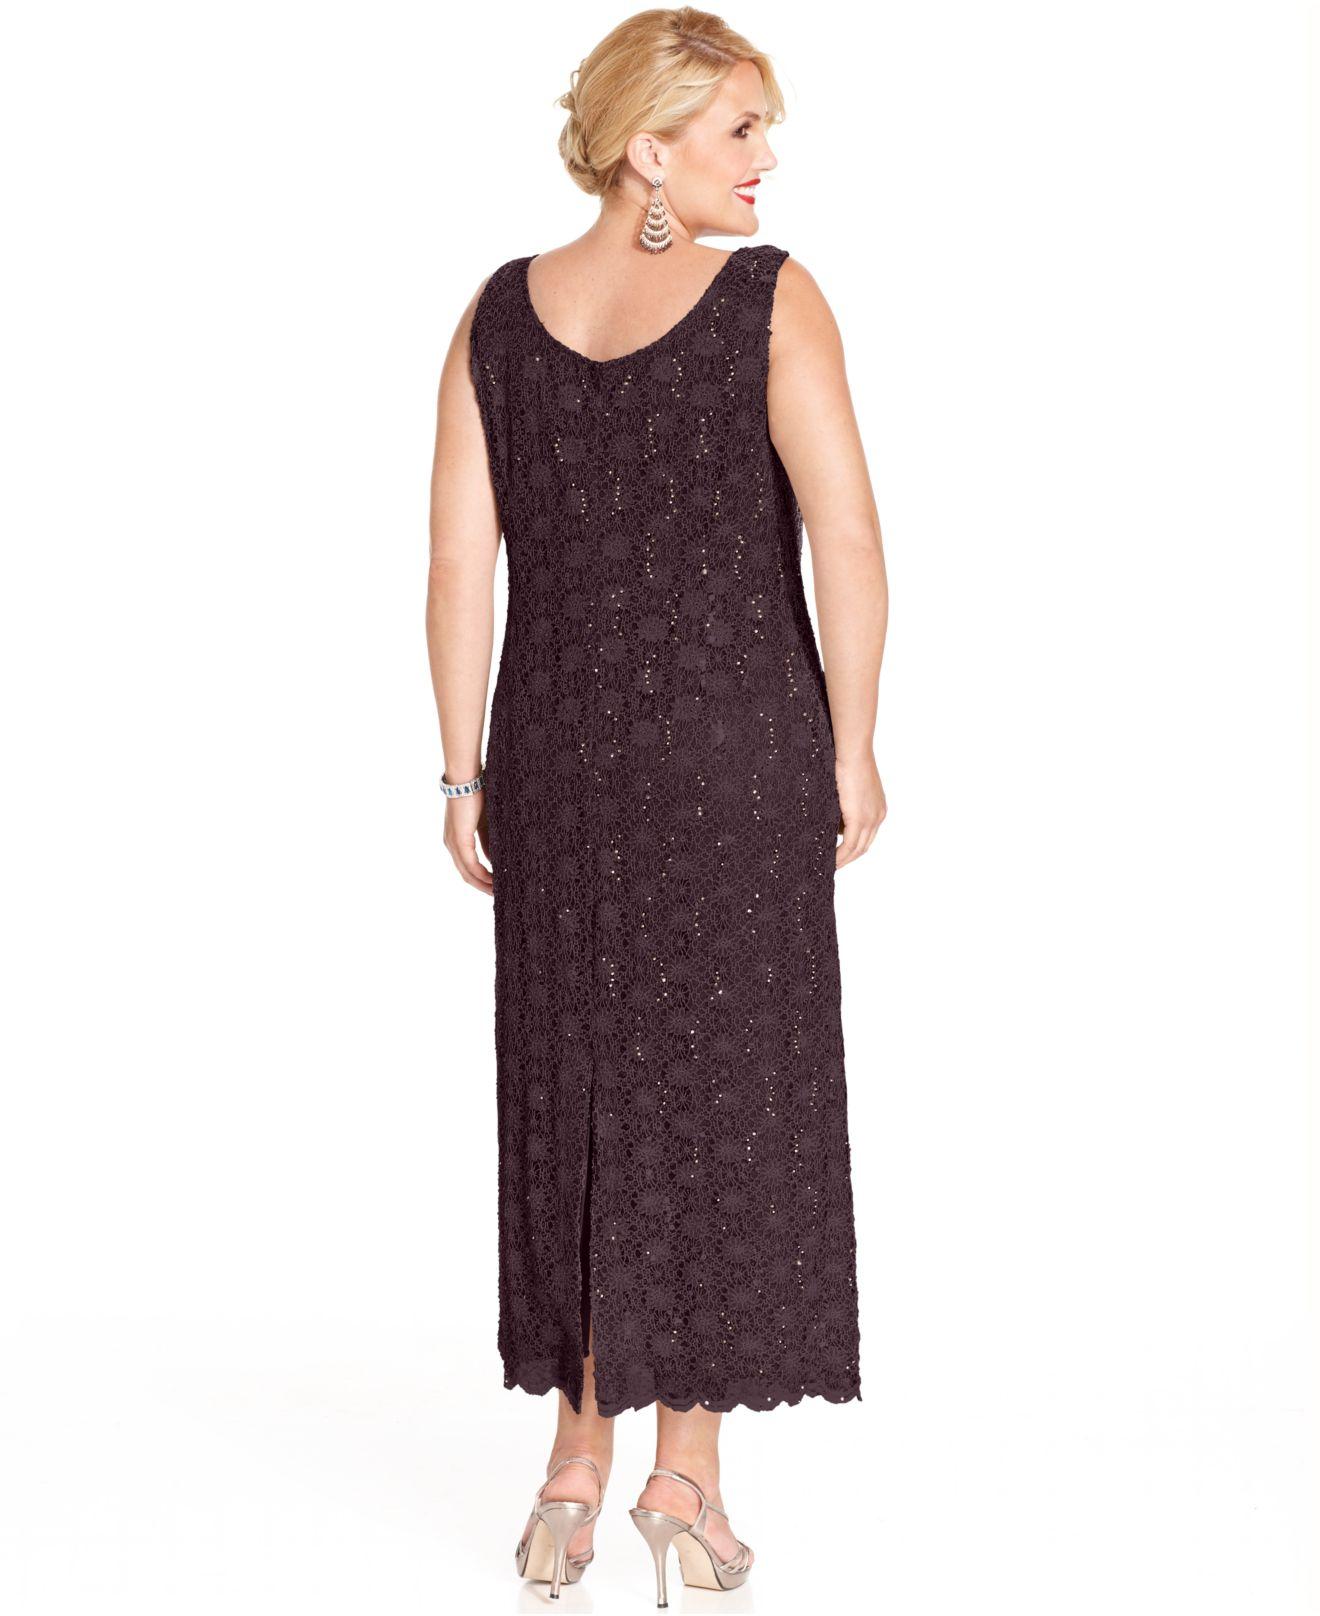 Lyst - R & M Richards Plus Size Dress And Jacket, Sleeveless ...